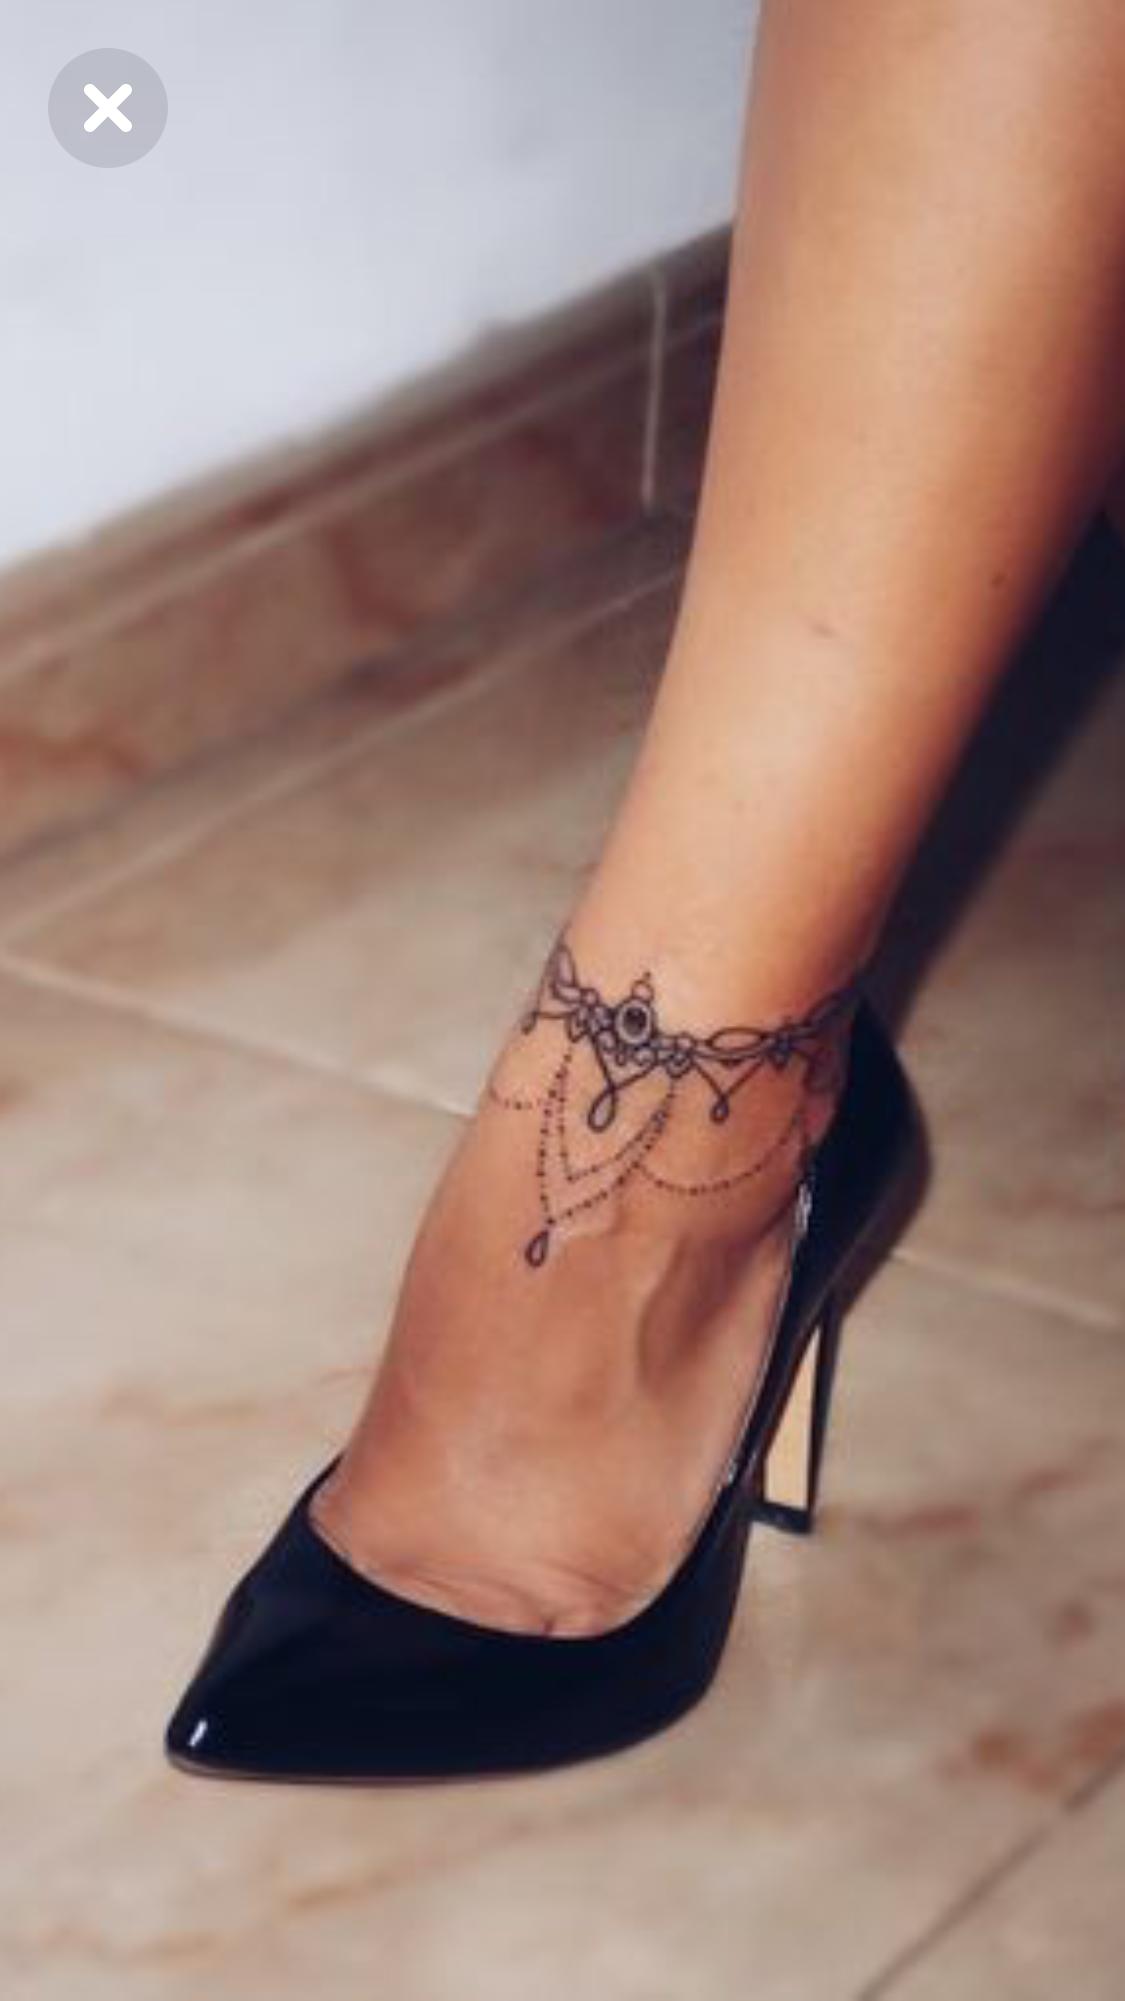 Pin De Marie01 En Tatouages Tatuajes Tobillo Tatuaje Tobillera Y